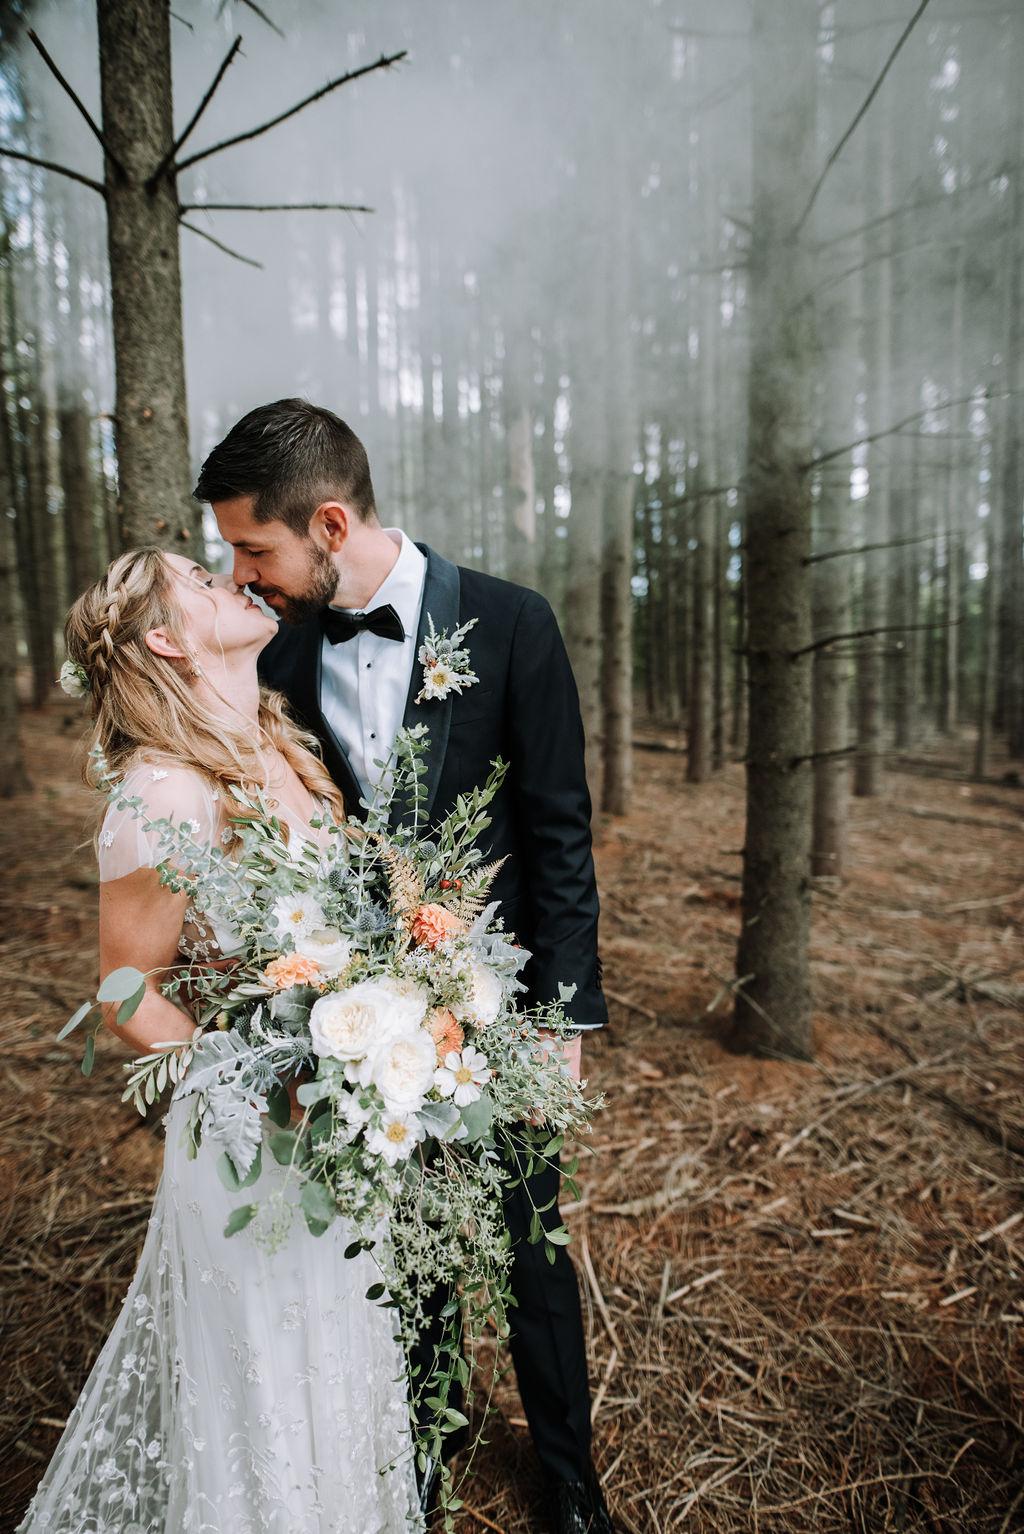 LUVLENS_WEDDING_CHELSEAMIKE-162.jpg